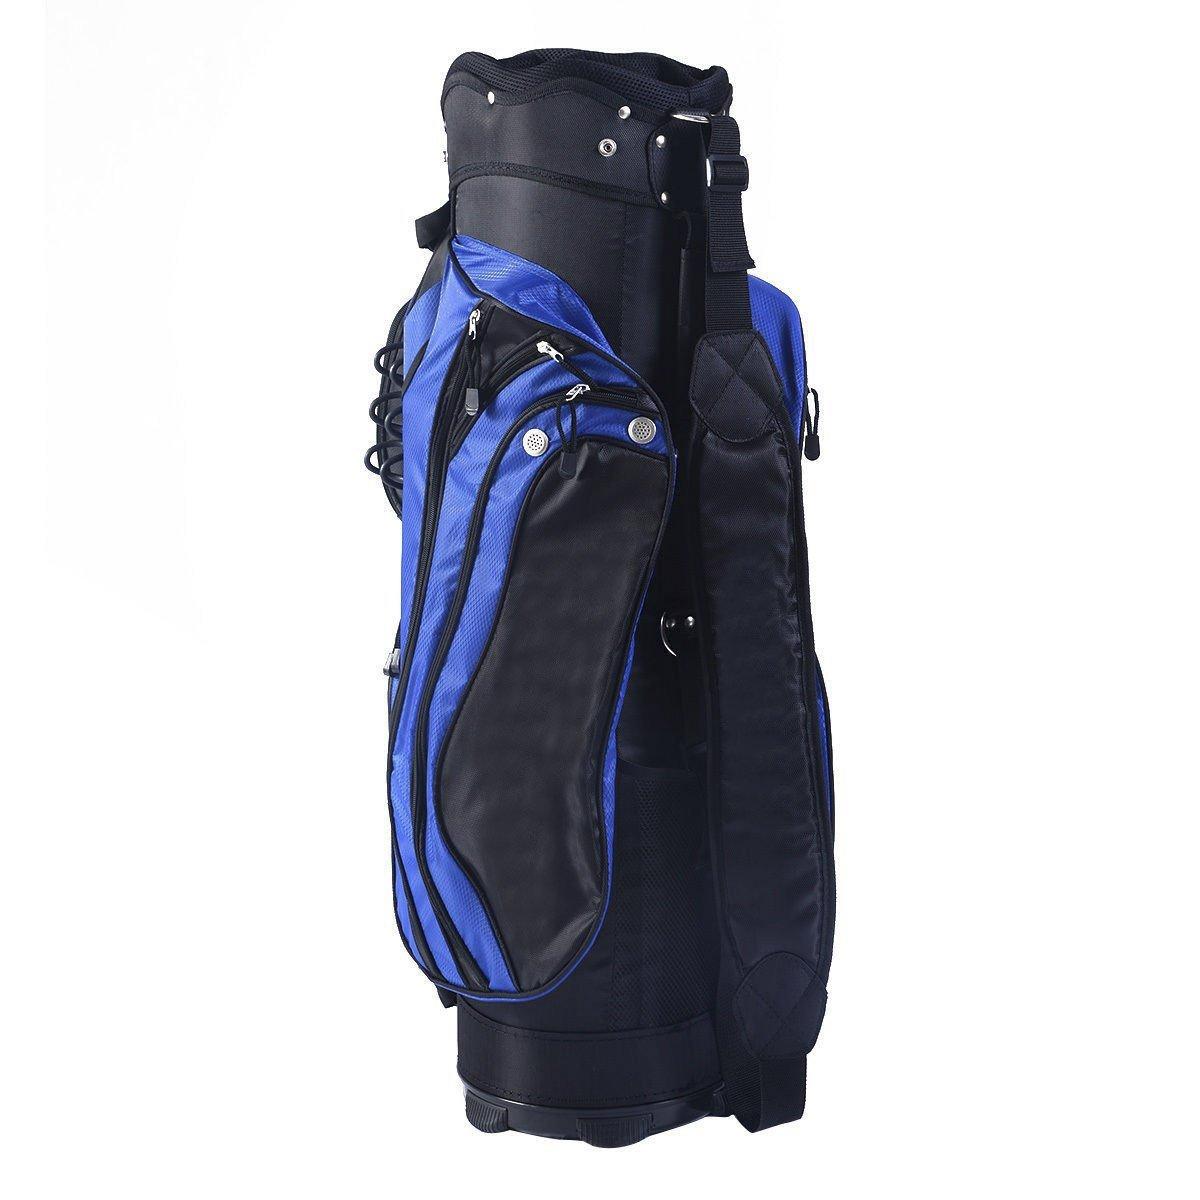 Tangkula 2016 Golf Carry Bag 14 Way Divider Lightweight w/Carry Belt Blk&Blue by TANGKULA (Image #1)